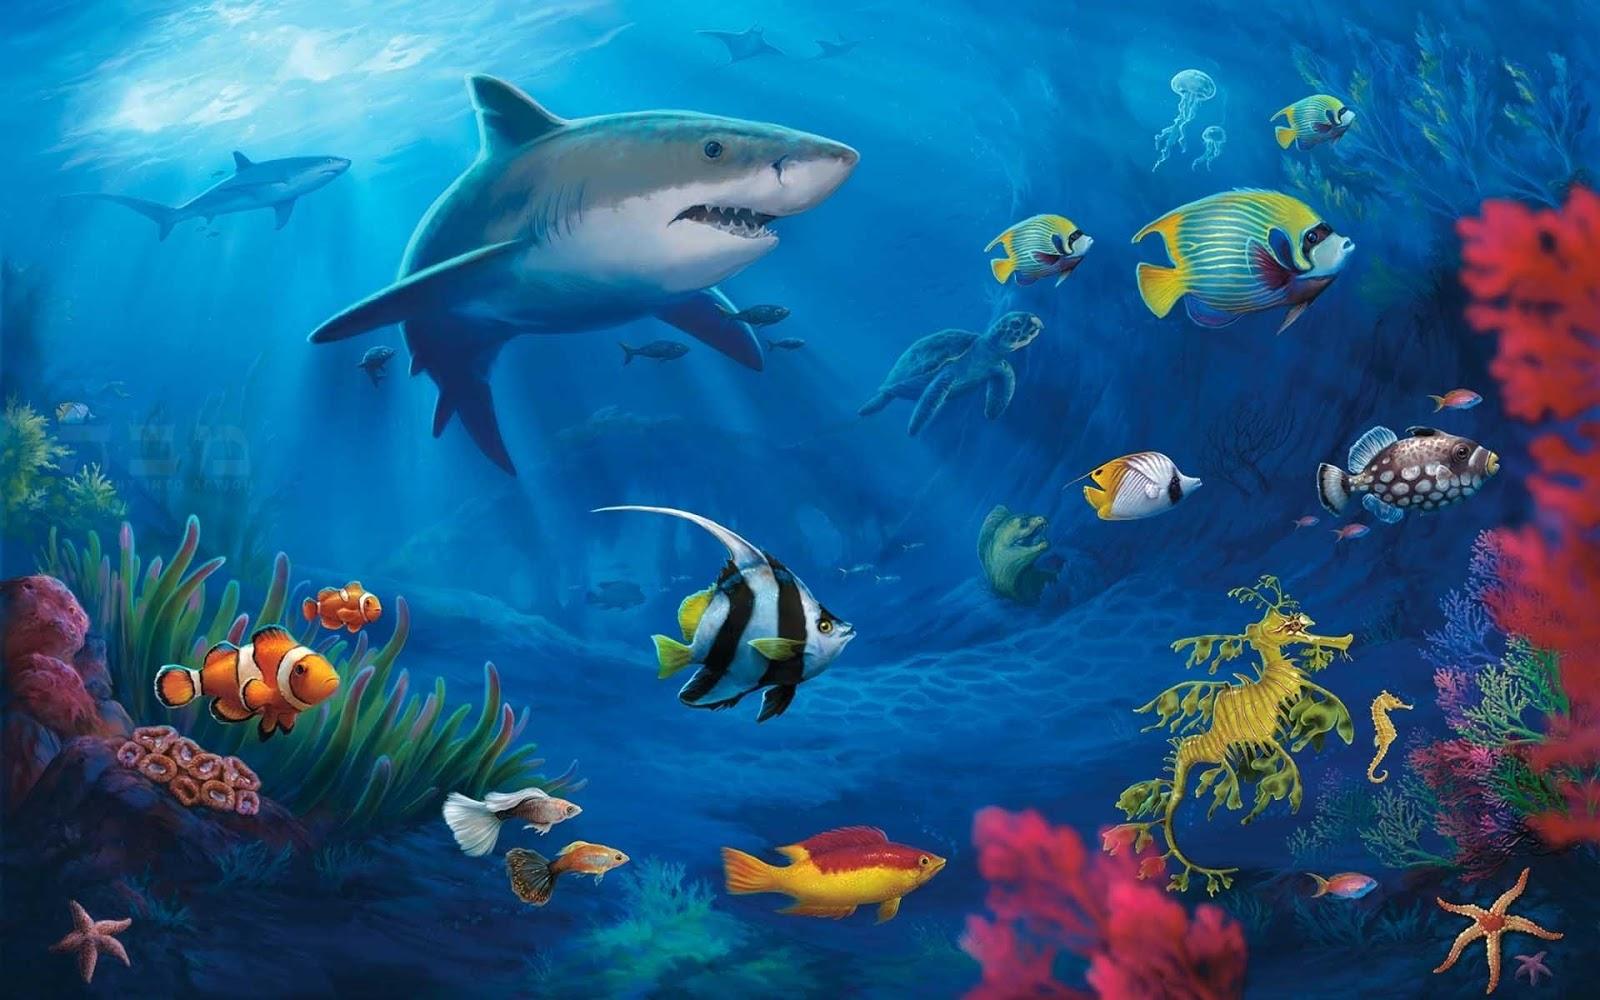 3d Wallpaper Artistic Hd Wallpapers Desktop Ocean Life Hd Desktop Wallpapers